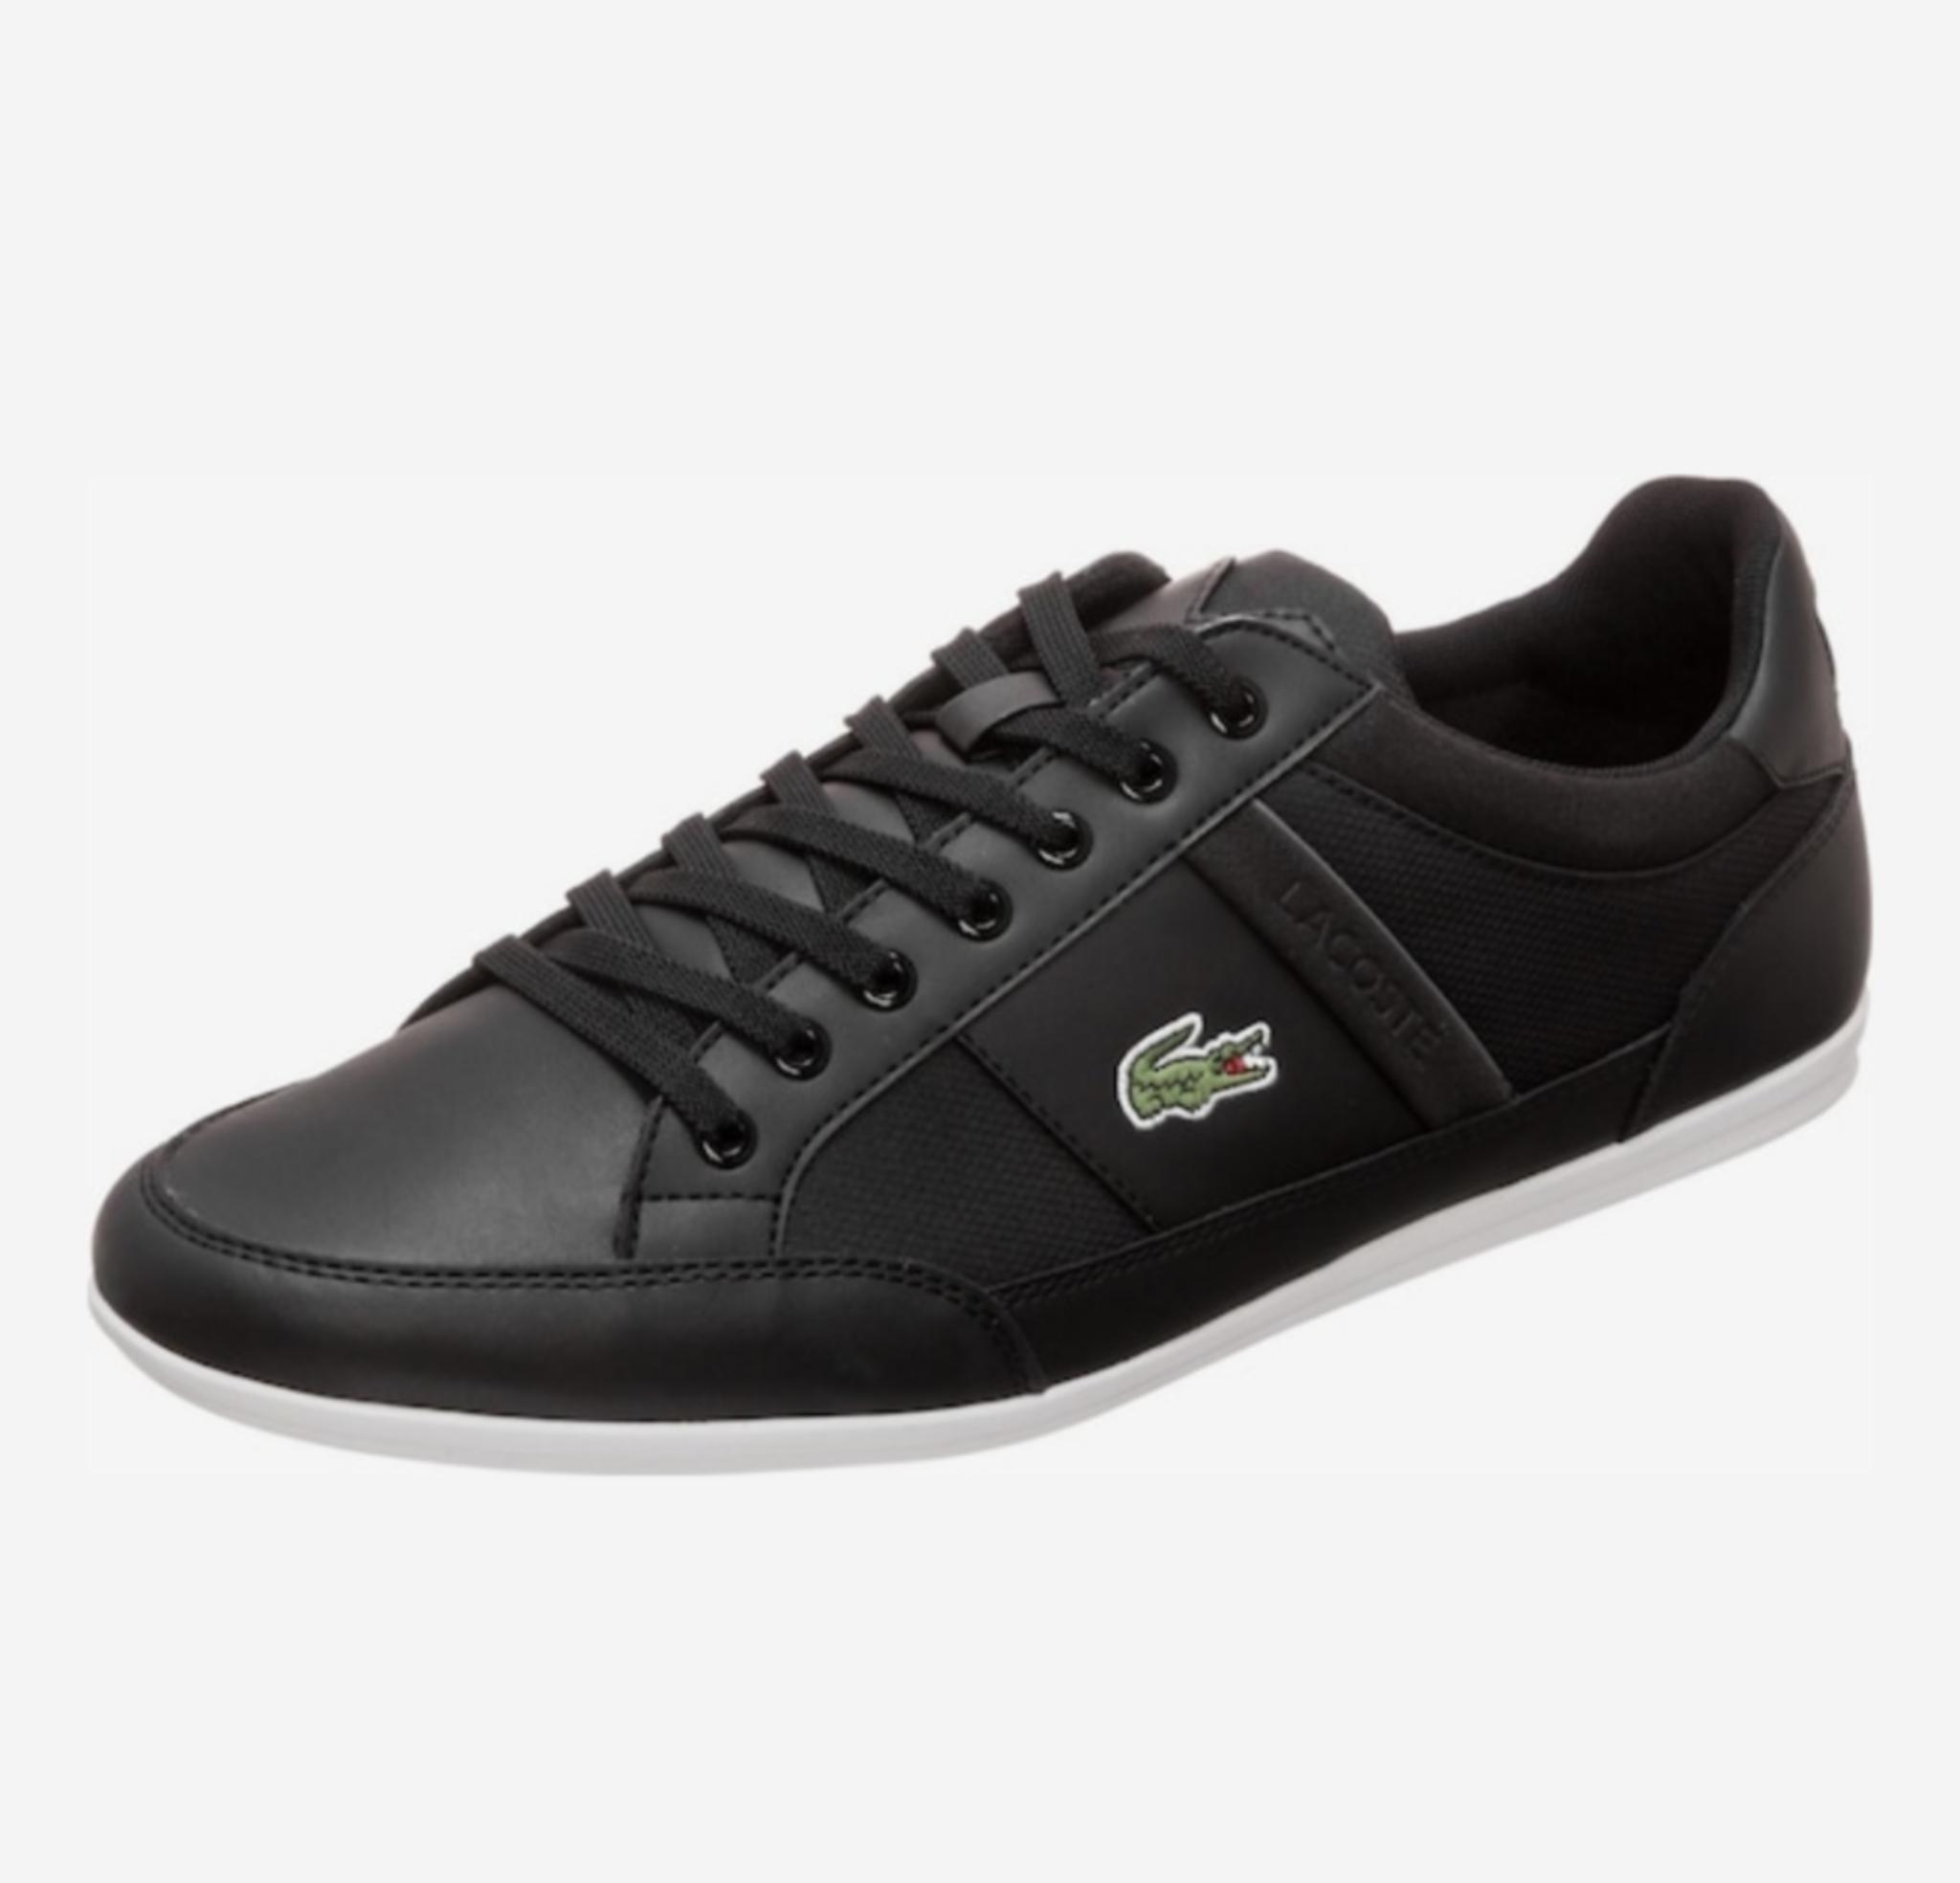 Lacoste Chaymon Sneaker für 55€ durch 30% bei About You